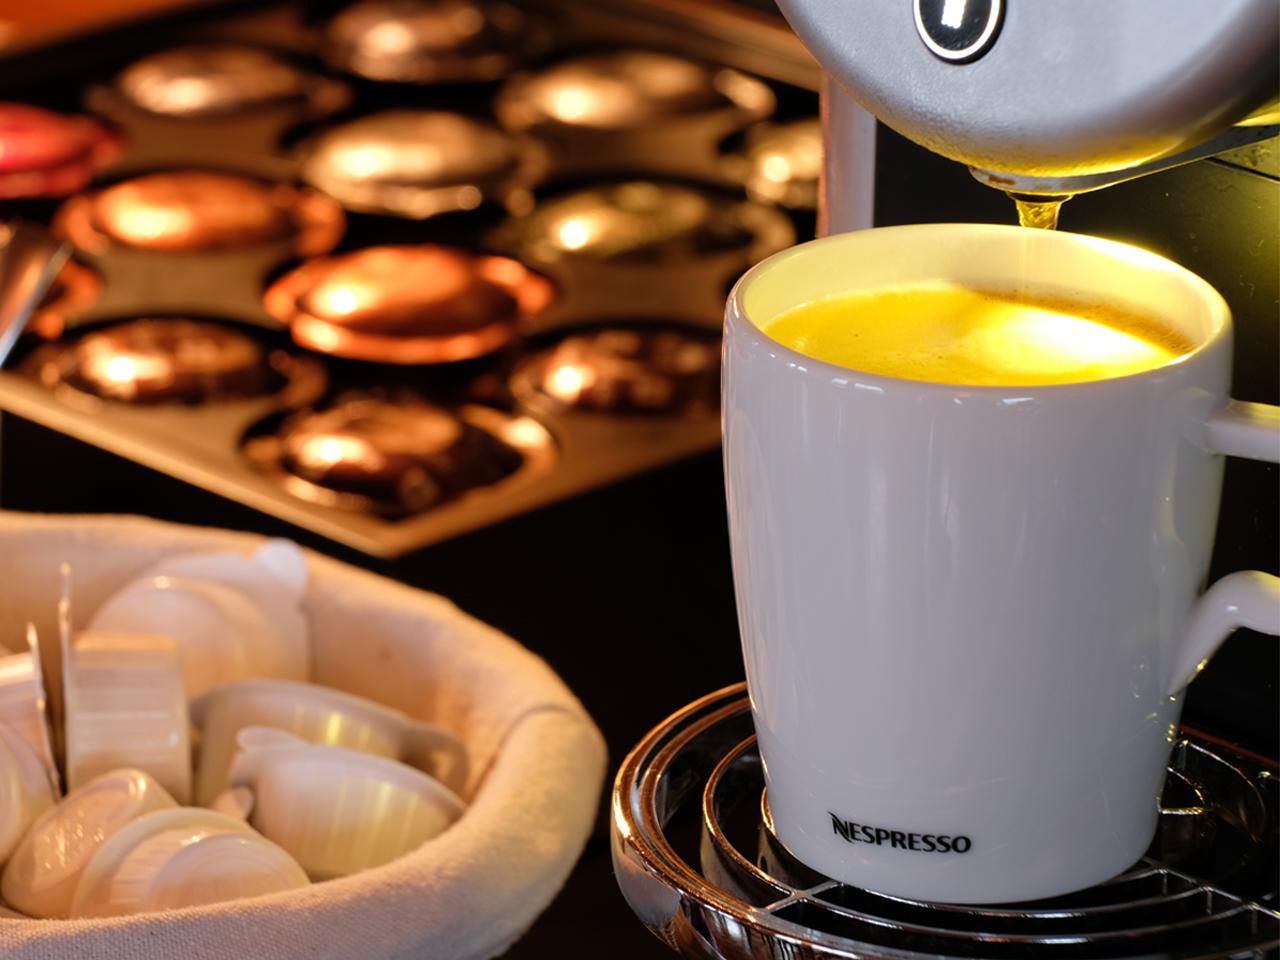 Ontbijt - Nespresso